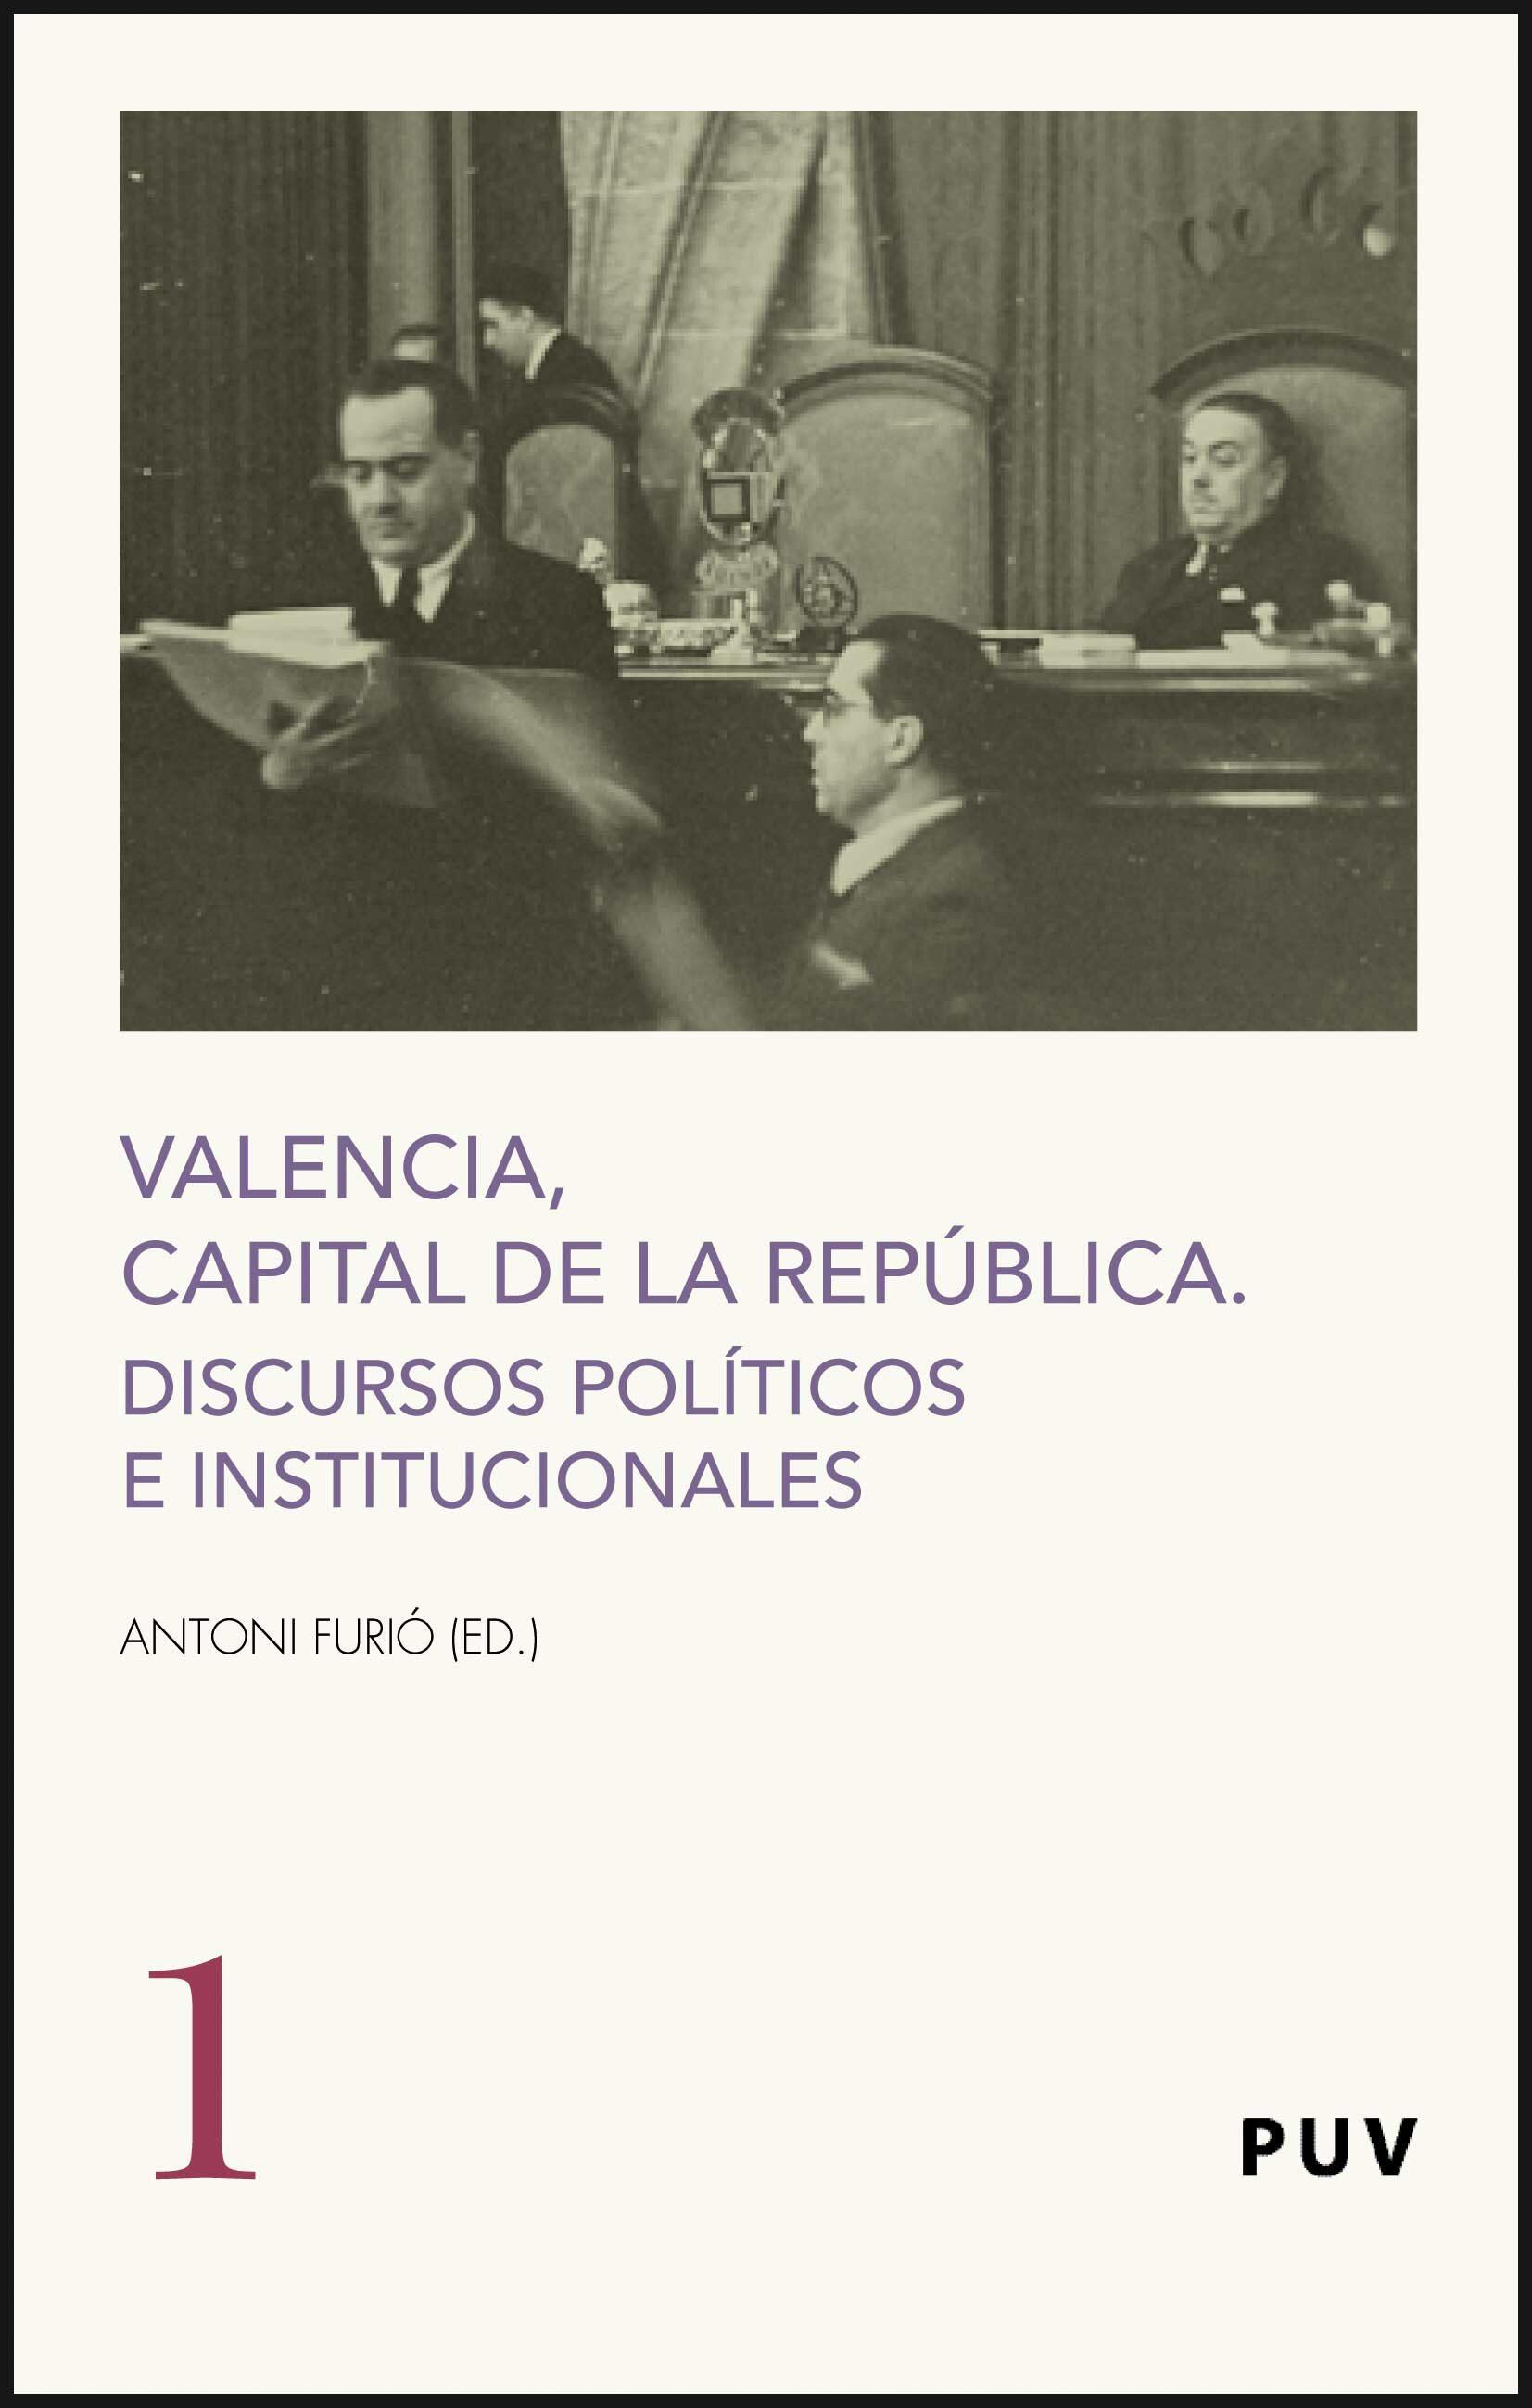 Valencia Capital De La Republica: Discursos Politicos E Instituci Onales por Furio Antonio epub